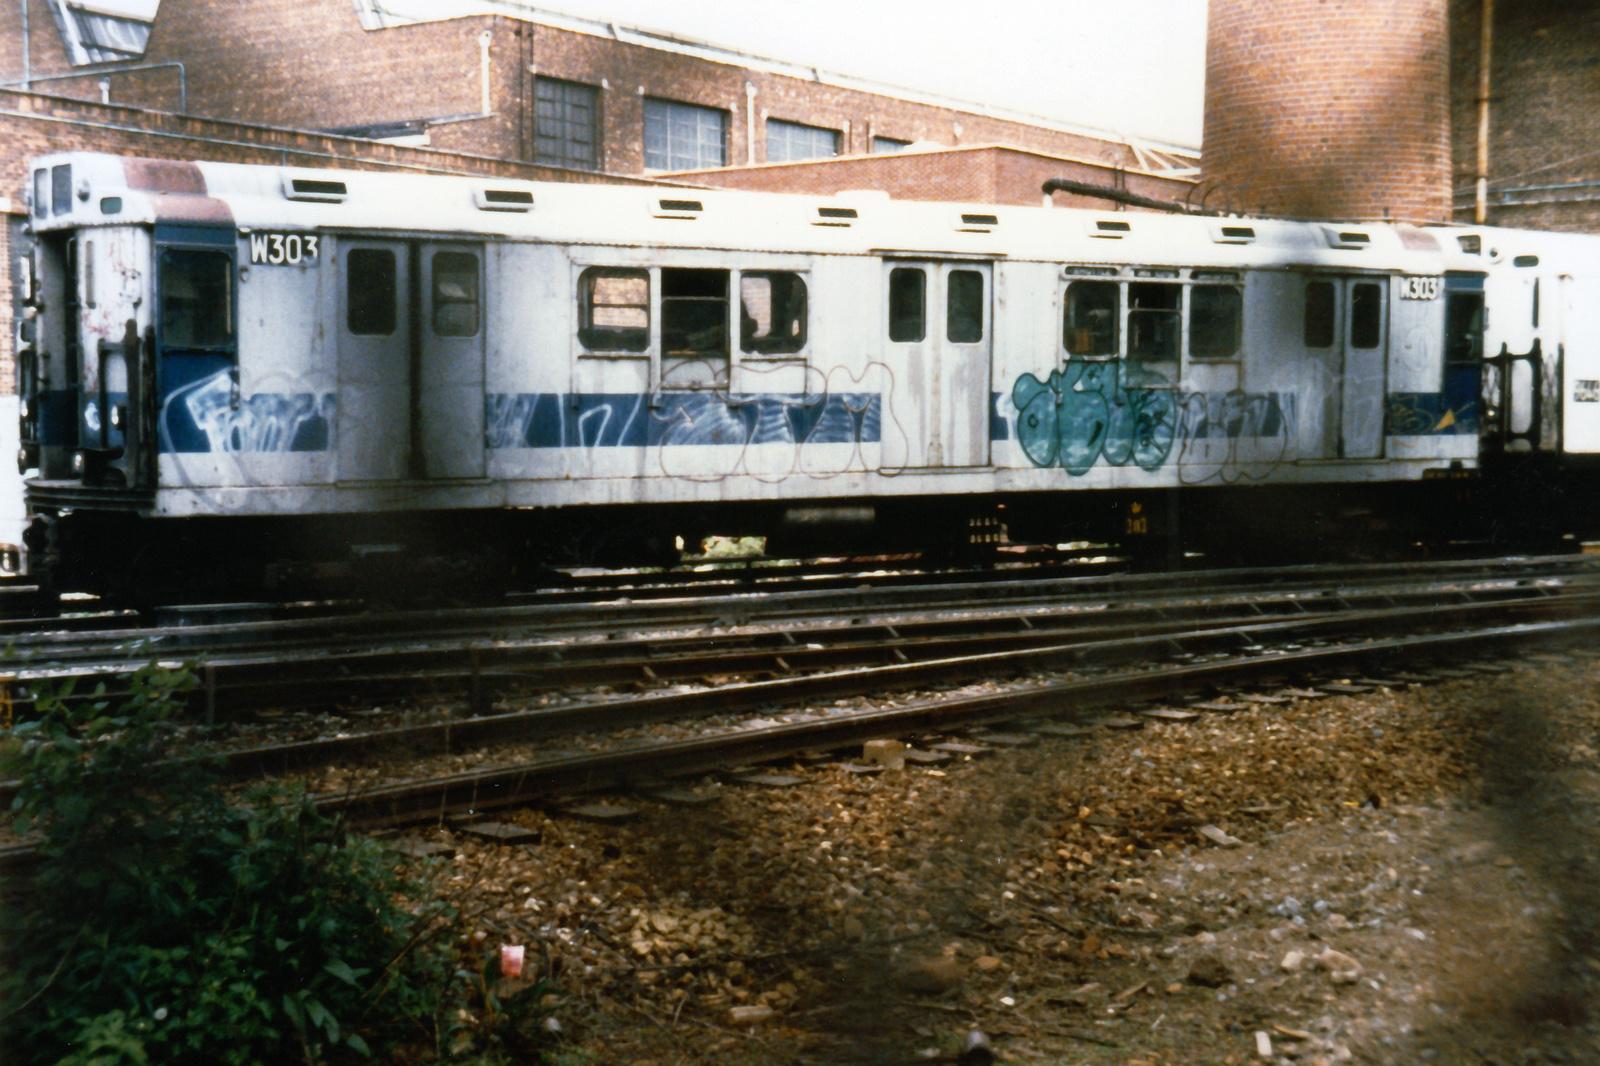 (767k, 1600x1066)<br><b>Country:</b> United States<br><b>City:</b> New York<br><b>System:</b> New York City Transit<br><b>Location:</b> Coney Island Yard<br><b>Car:</b> R-12 (American Car & Foundry, 1948) W303 (ex-5756)<br><b>Collection of:</b> Nicholas Fabrizio<br><b>Notes:</b> Welding supply car.<br><b>Viewed (this week/total):</b> 30 / 101